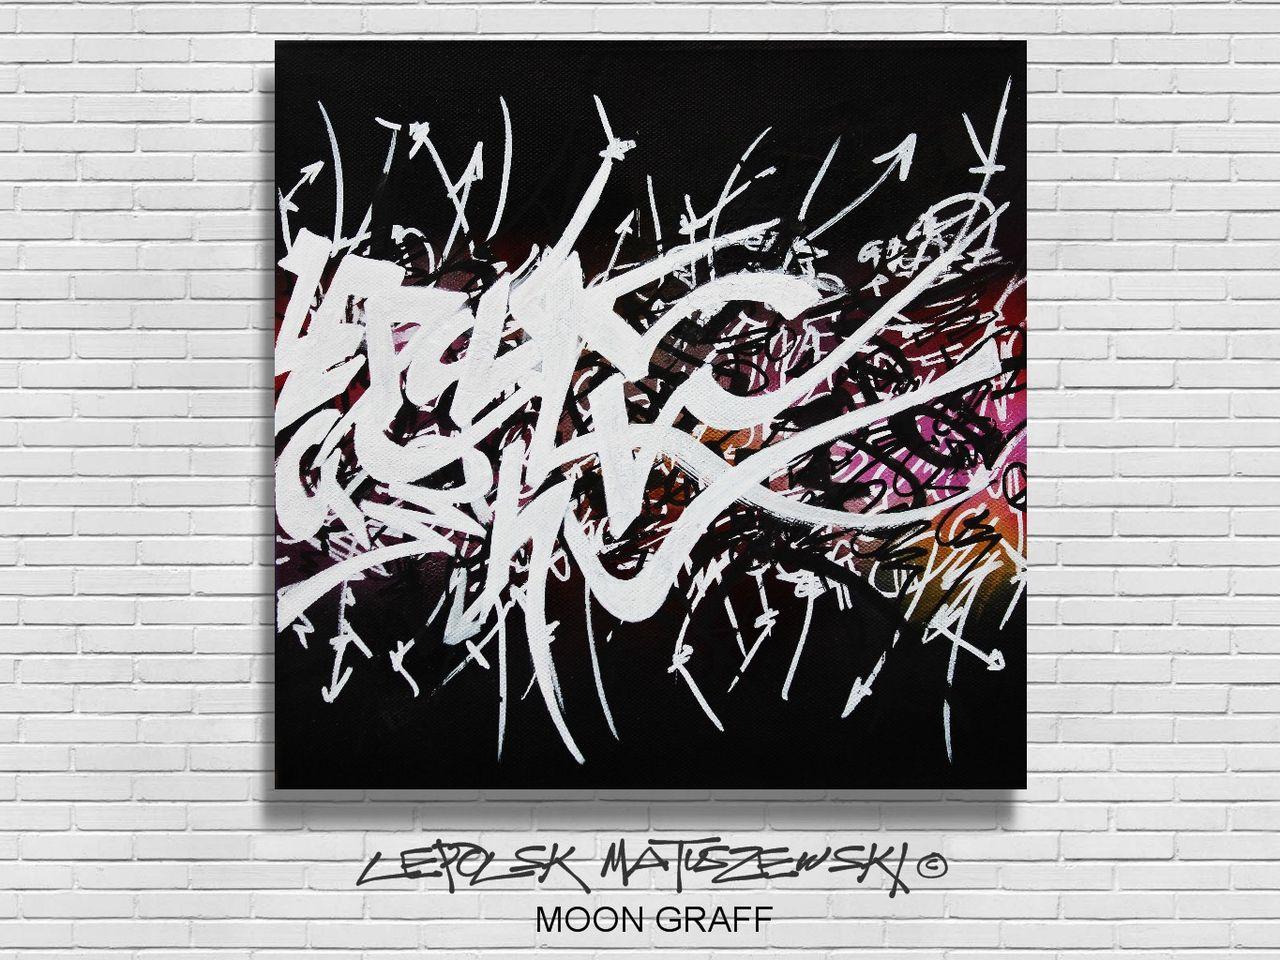 MK  Lepolsk Matuszewski MOON GRAFF street art calligraffiti graffiti abstrait